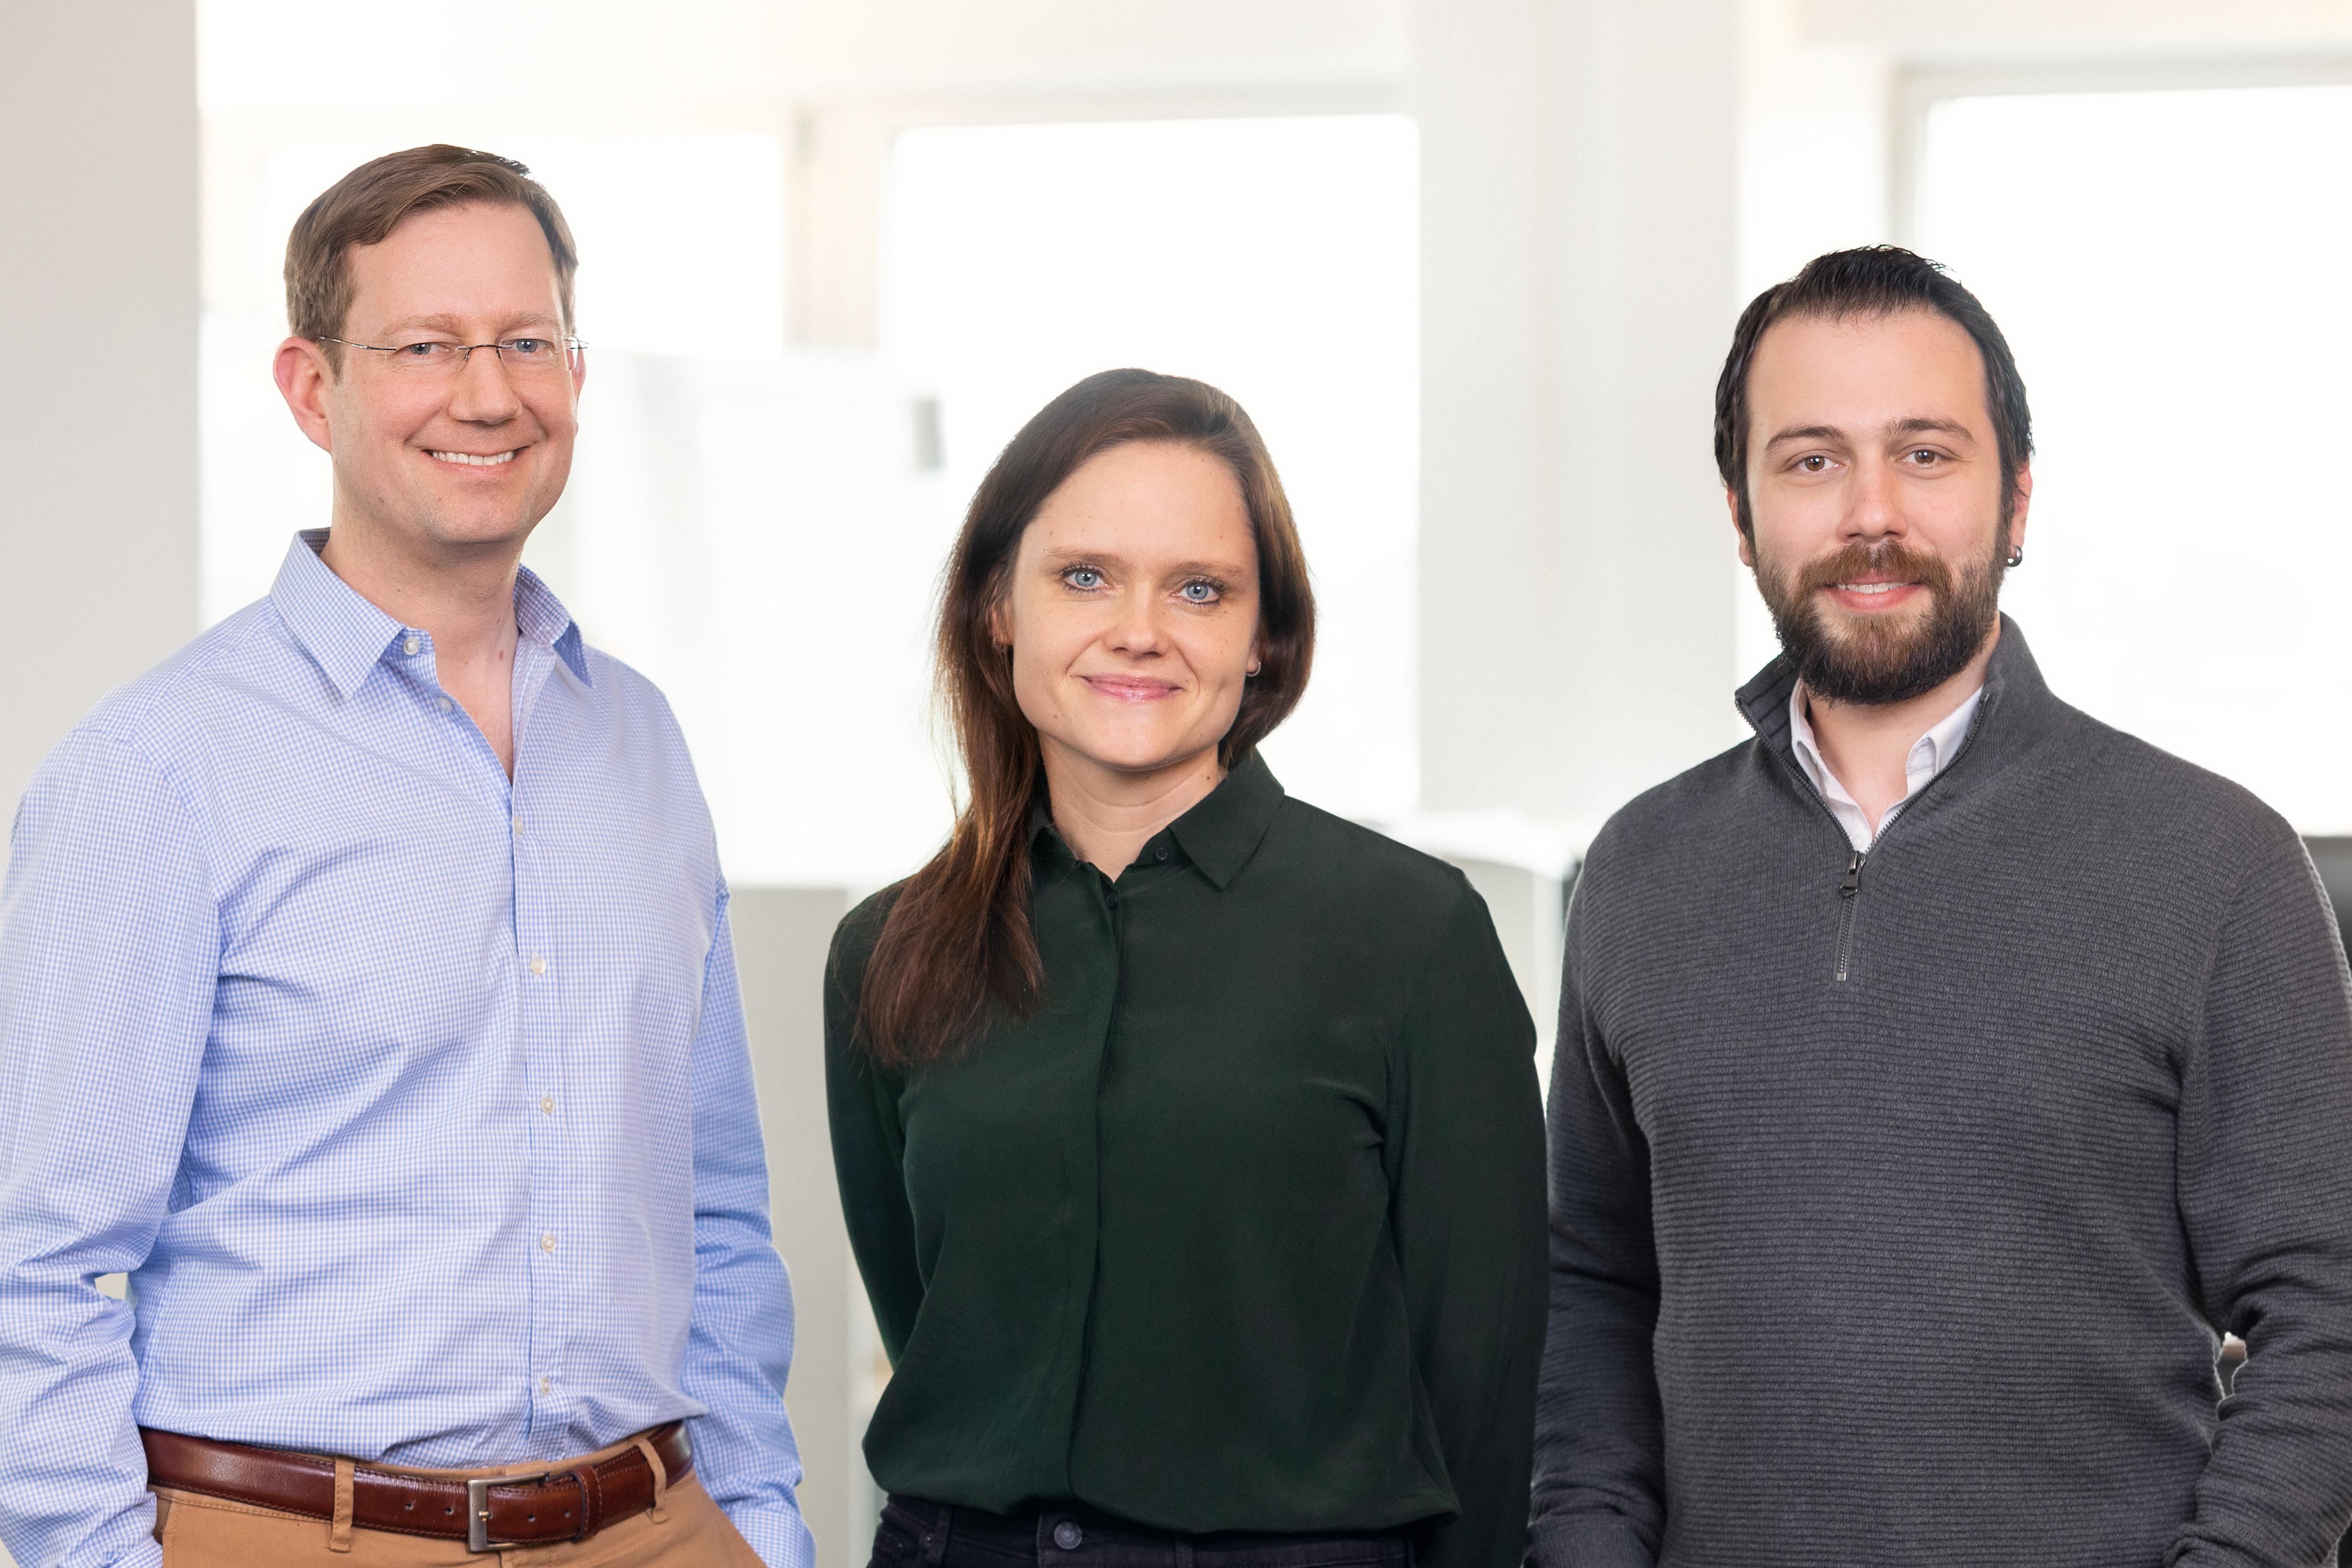 Markus Dränert, Cornelia Schwertner, Taner Akcok - copyright Robert Lehmann.jpg